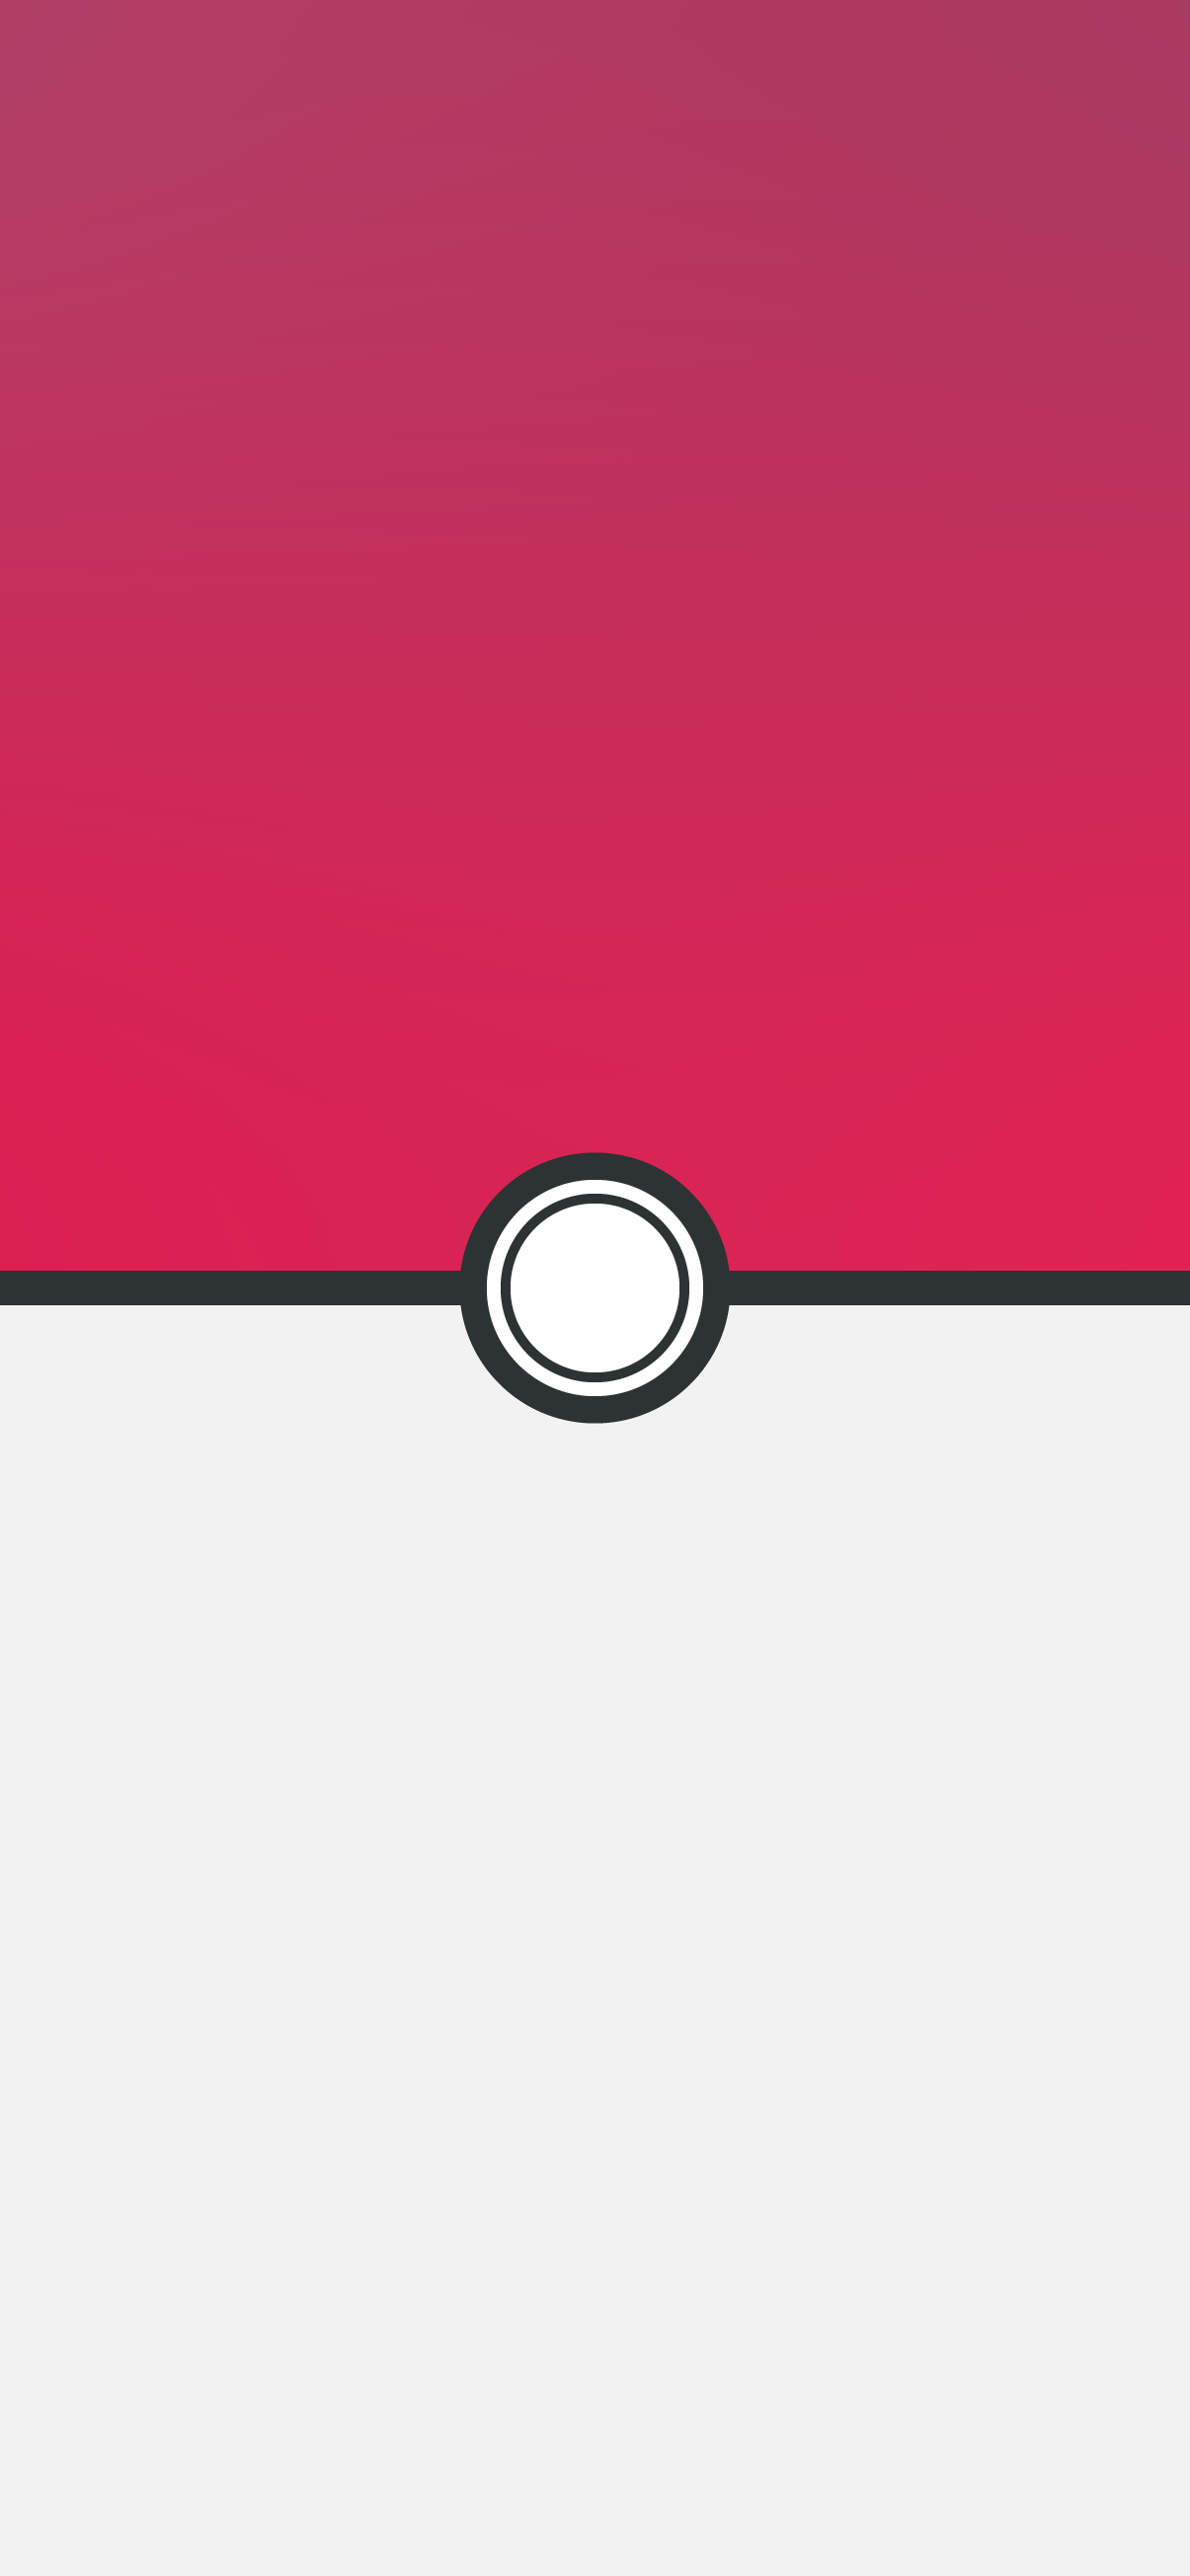 pokemon phone wallpaper 4k